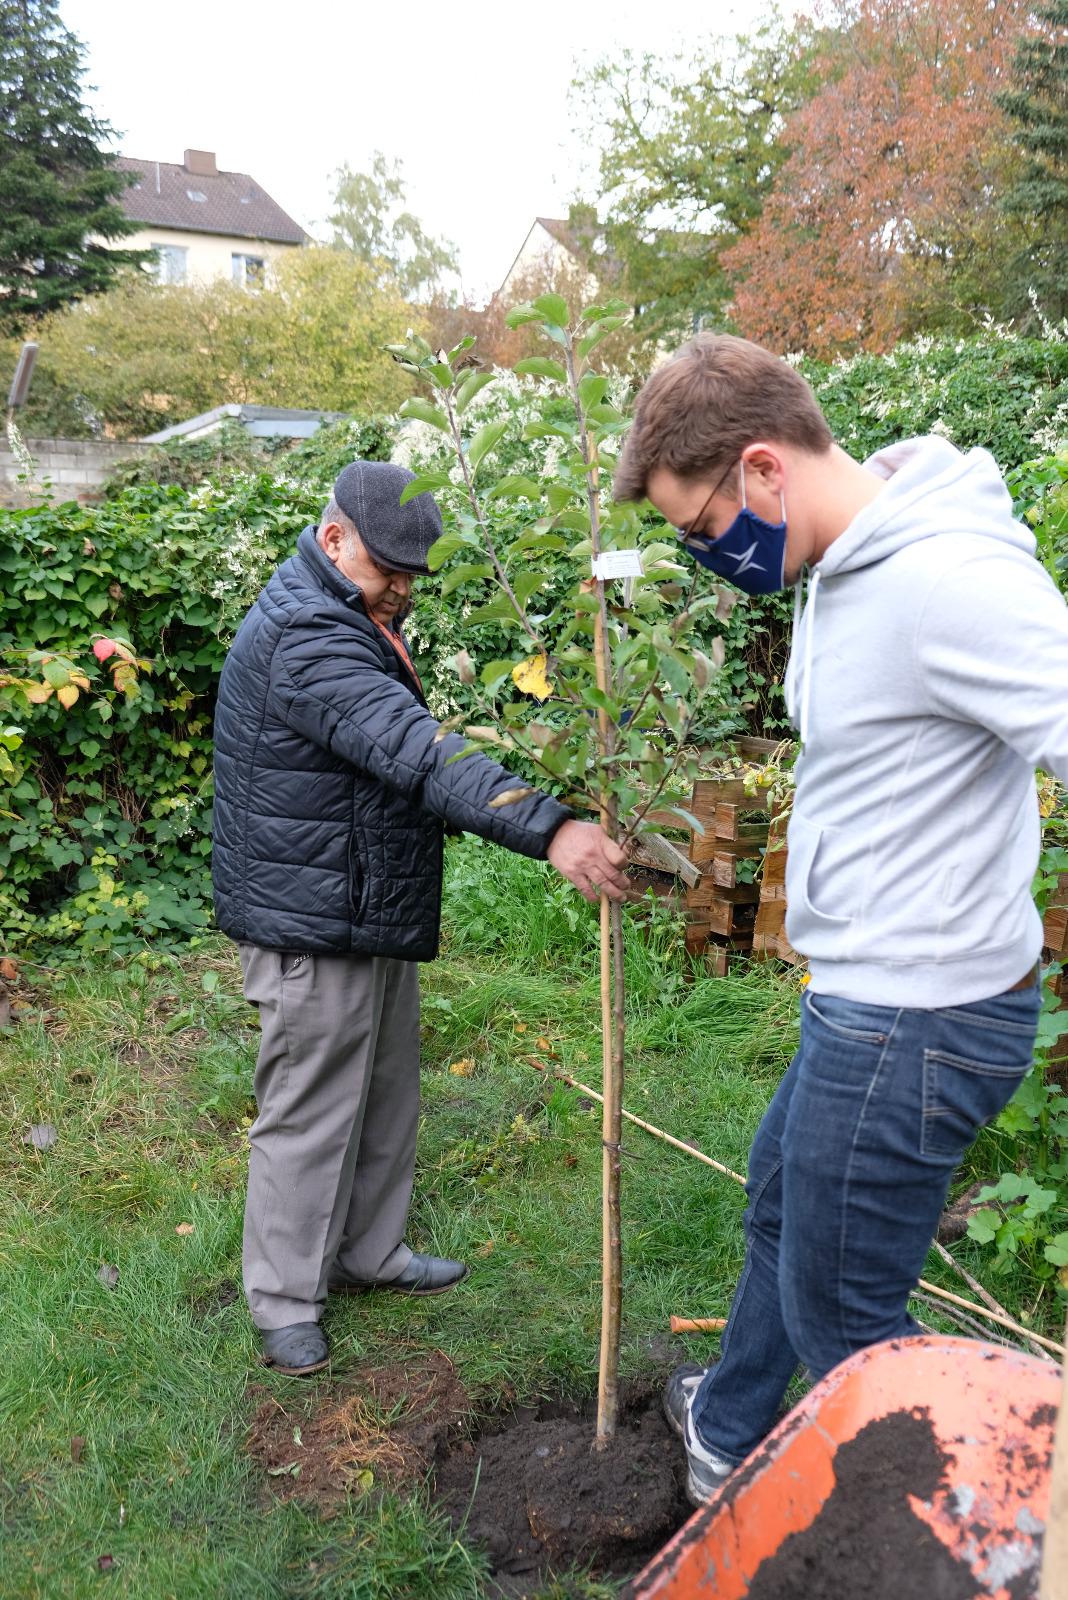 2020-10-24_Feidikforum_Apfelbaumpflanzung